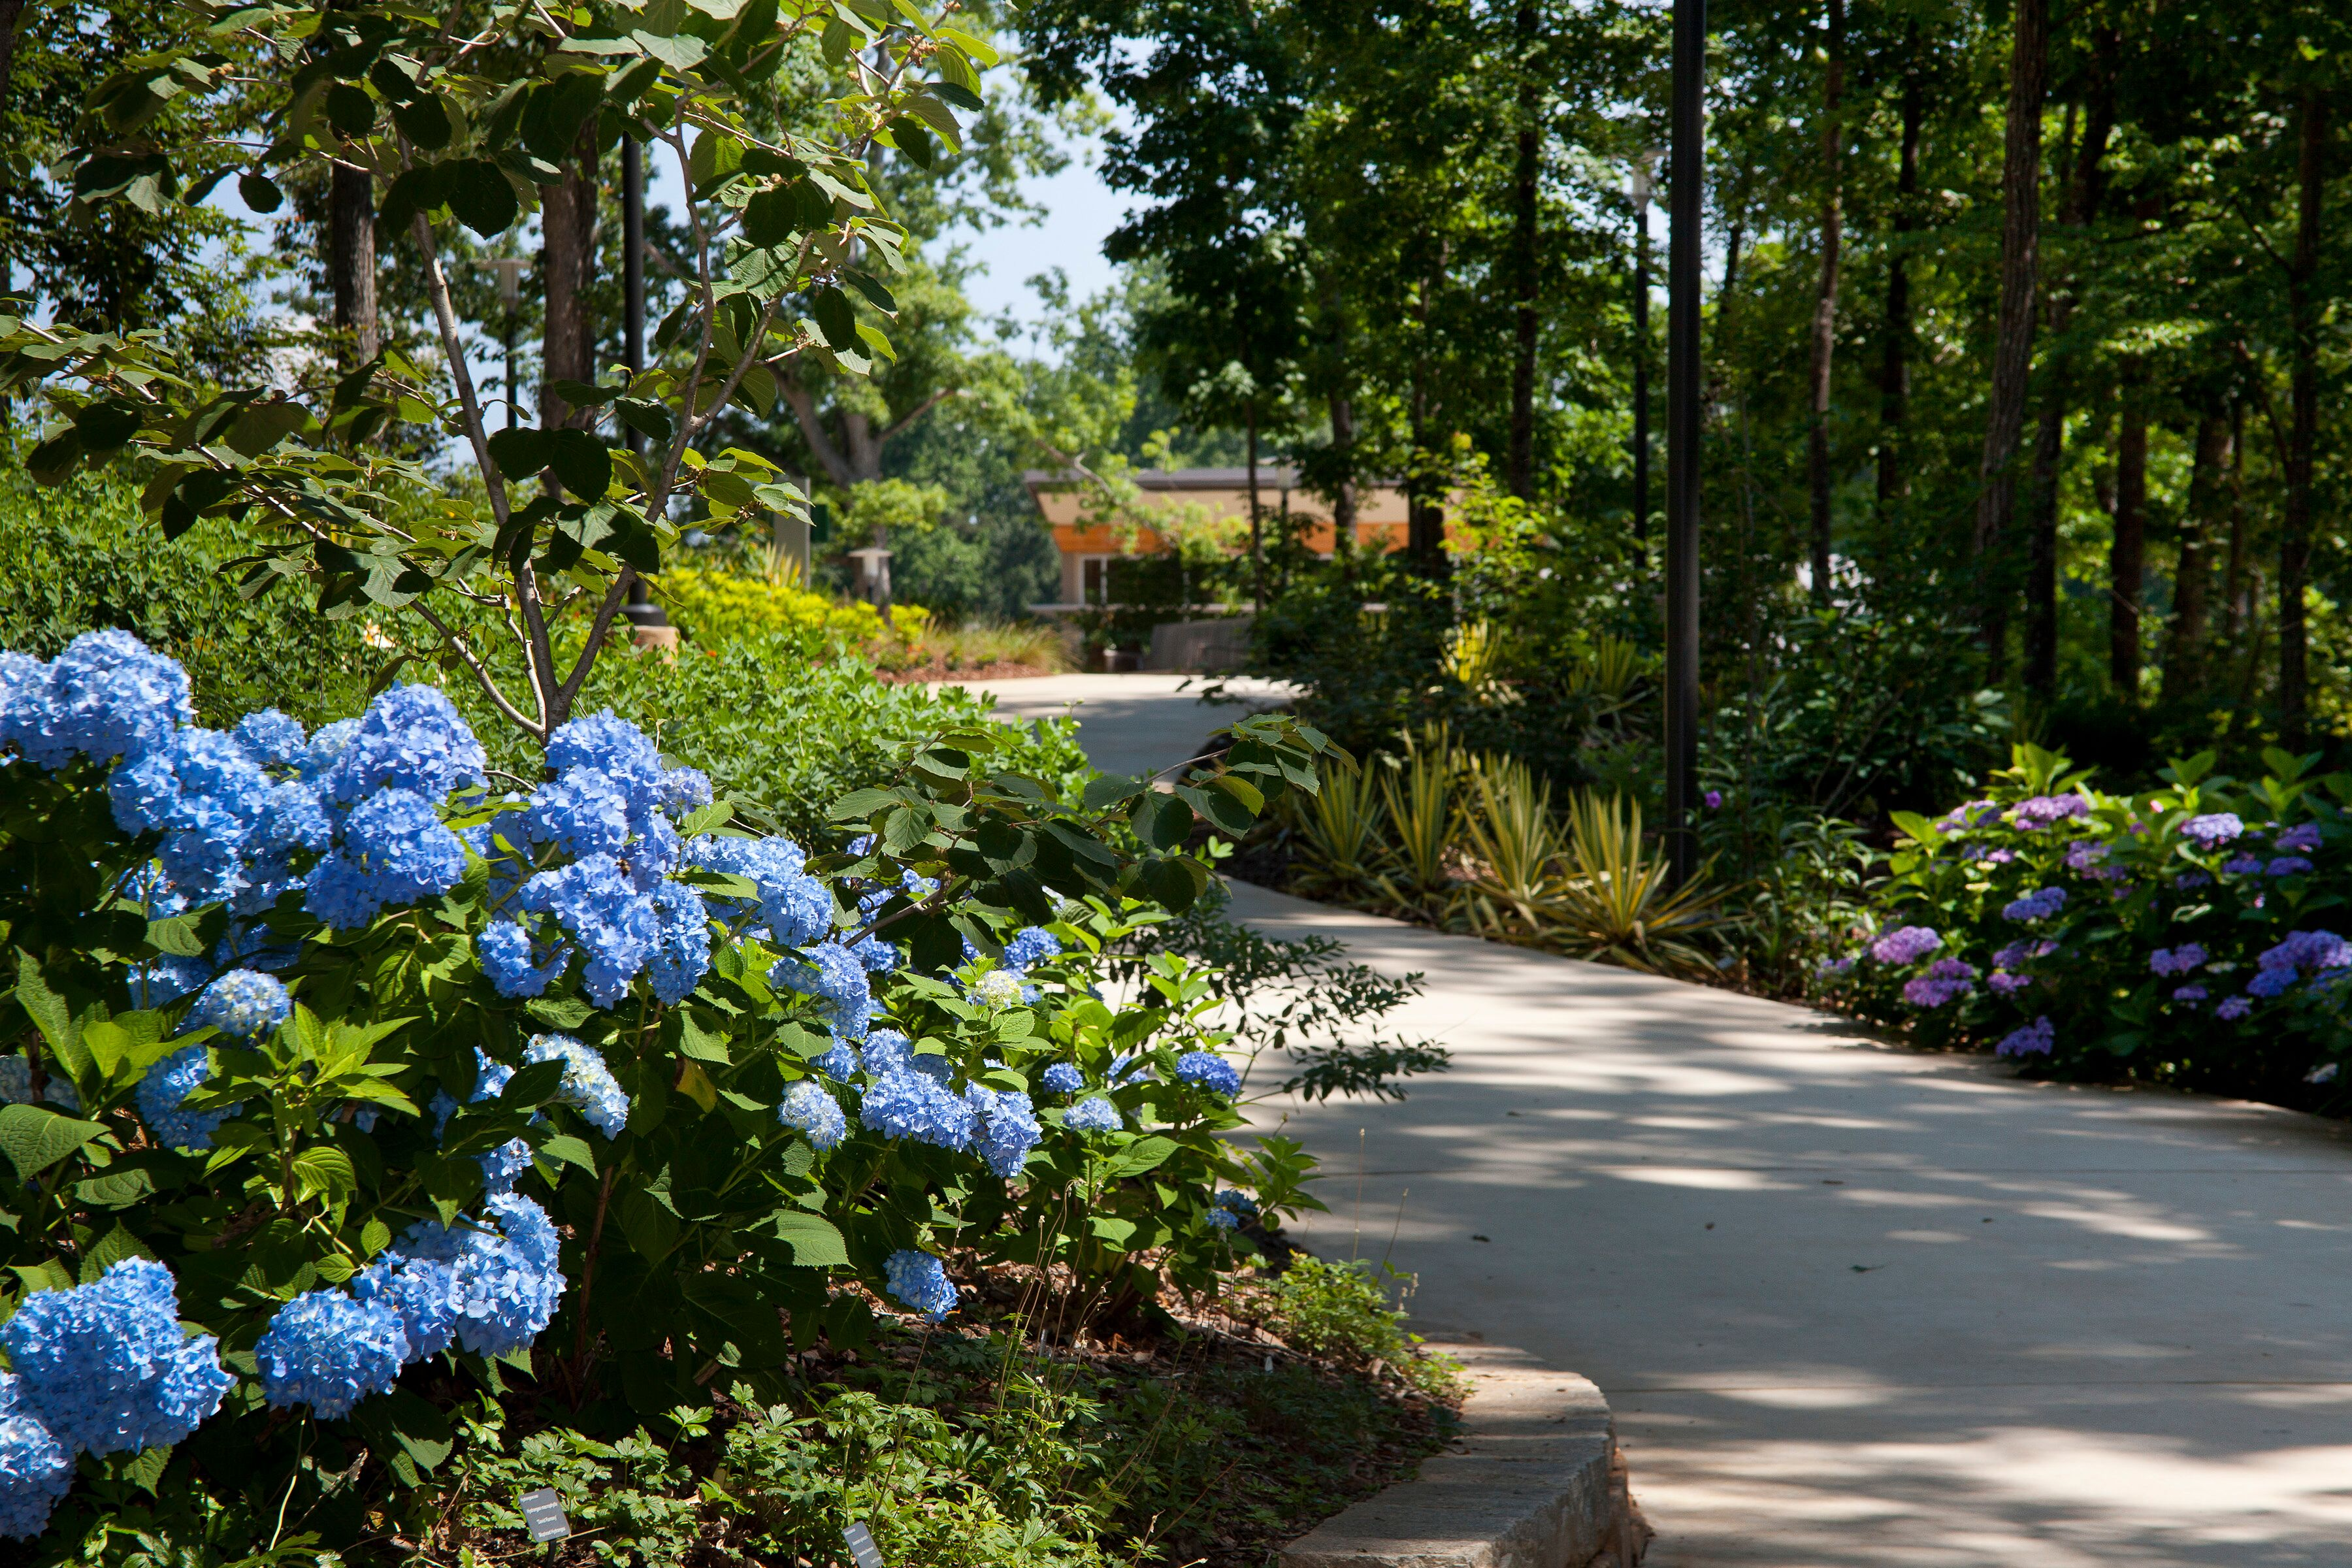 atlanta botanical garden gainesville gainesville ga - Gainesville Botanical Garden